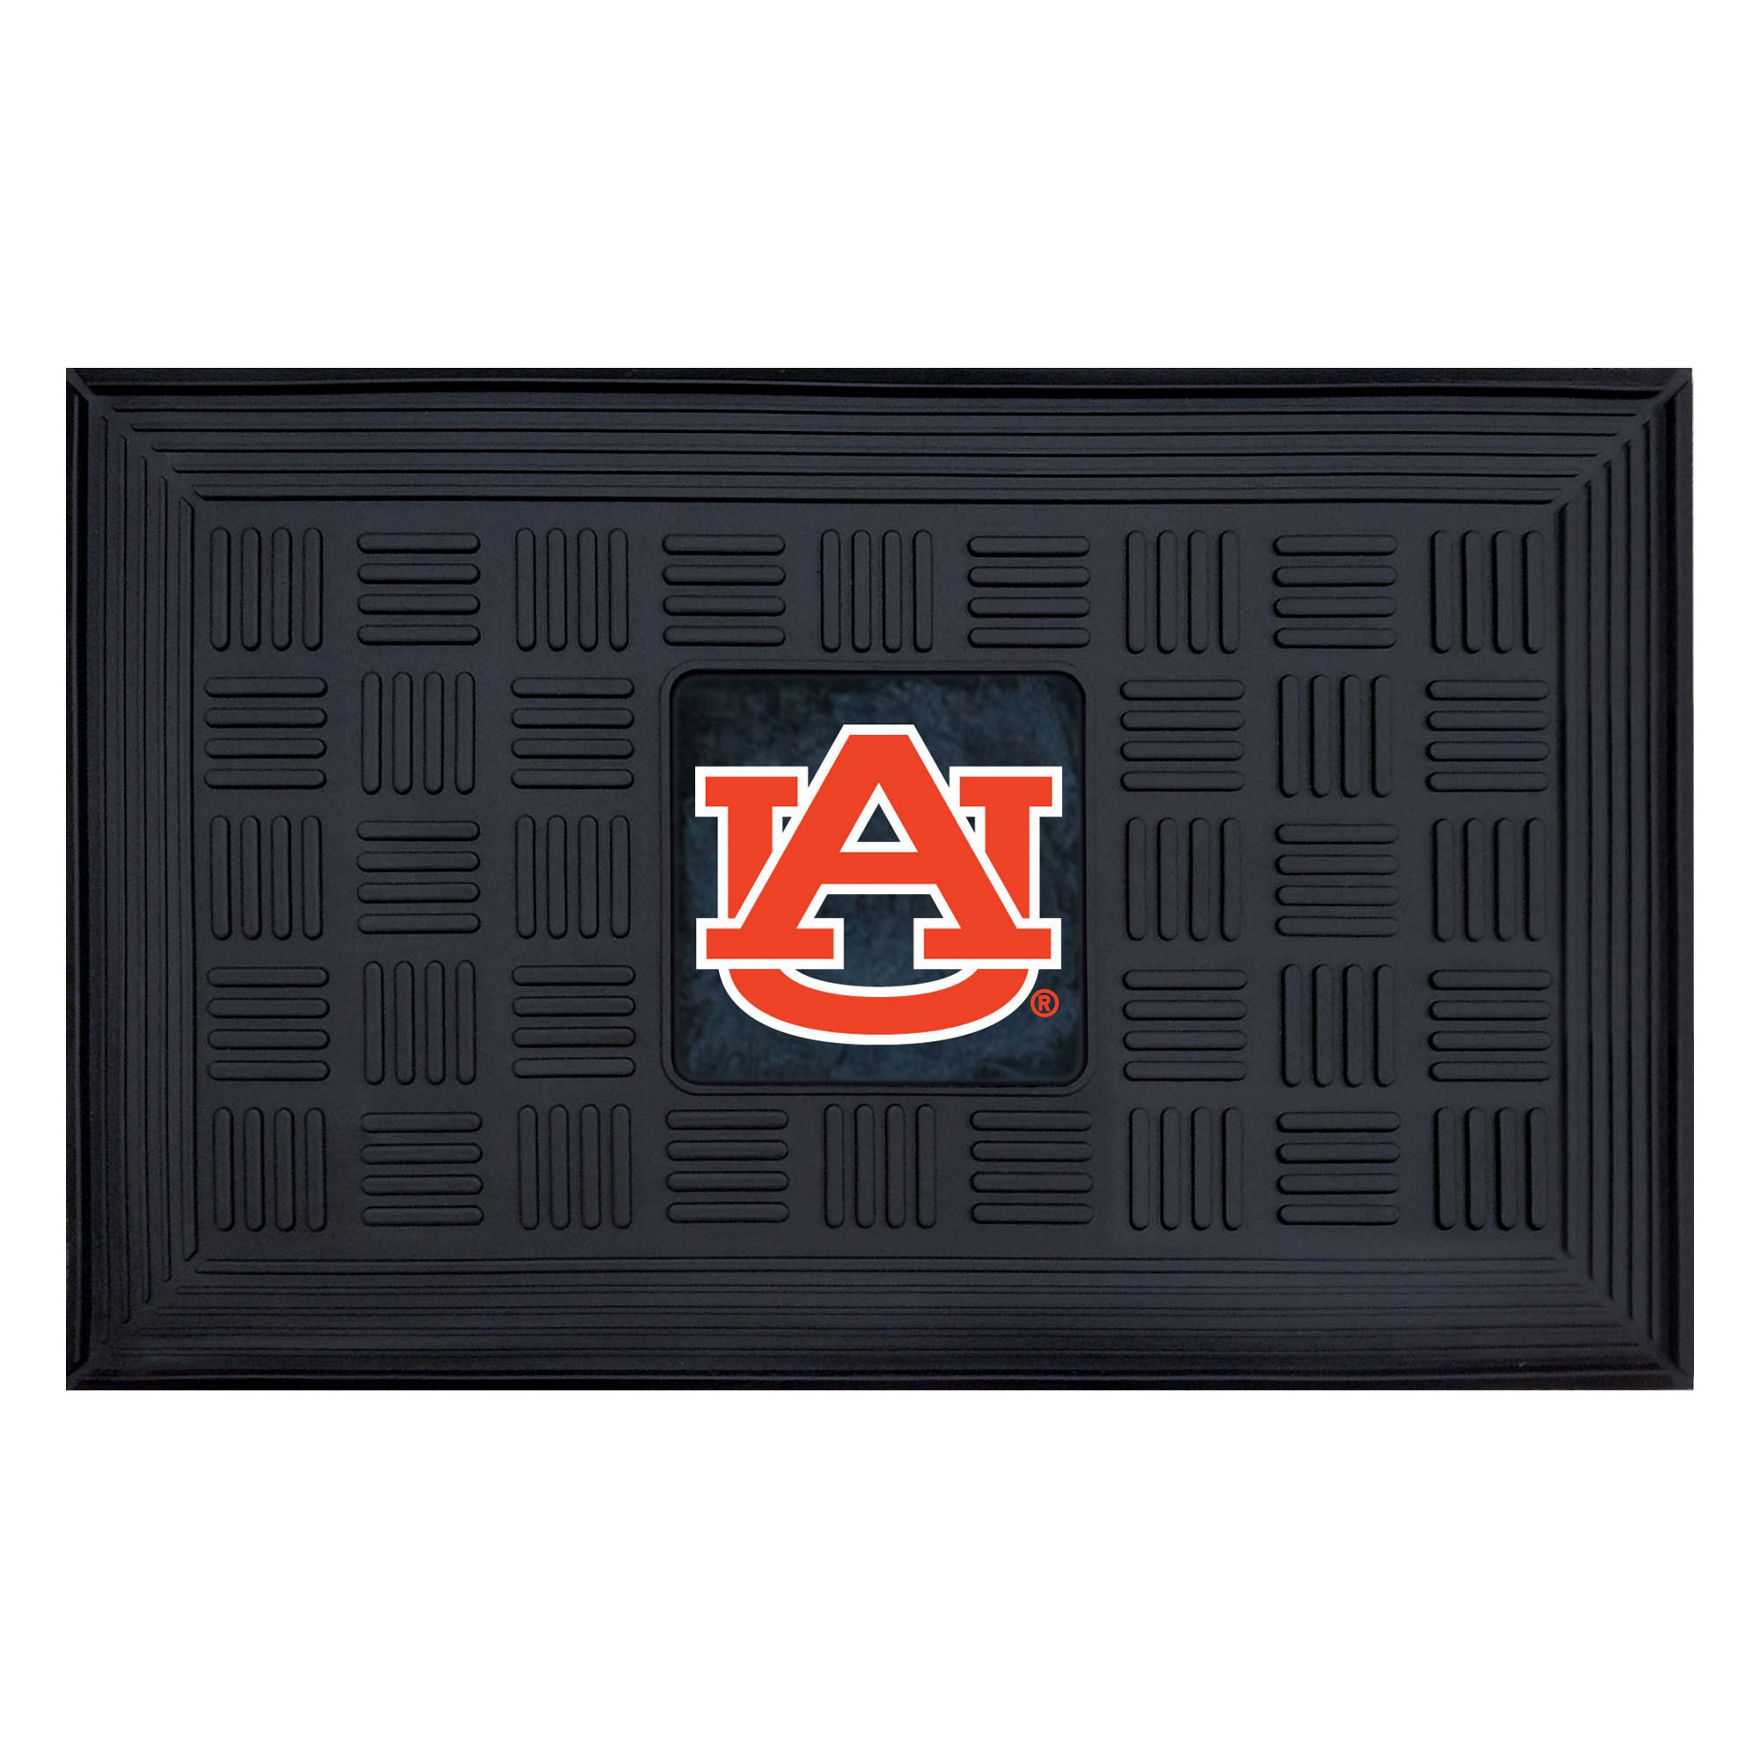 Fanmats Black Outdoor Rugs & Doormats NCAA Outdoor Decor